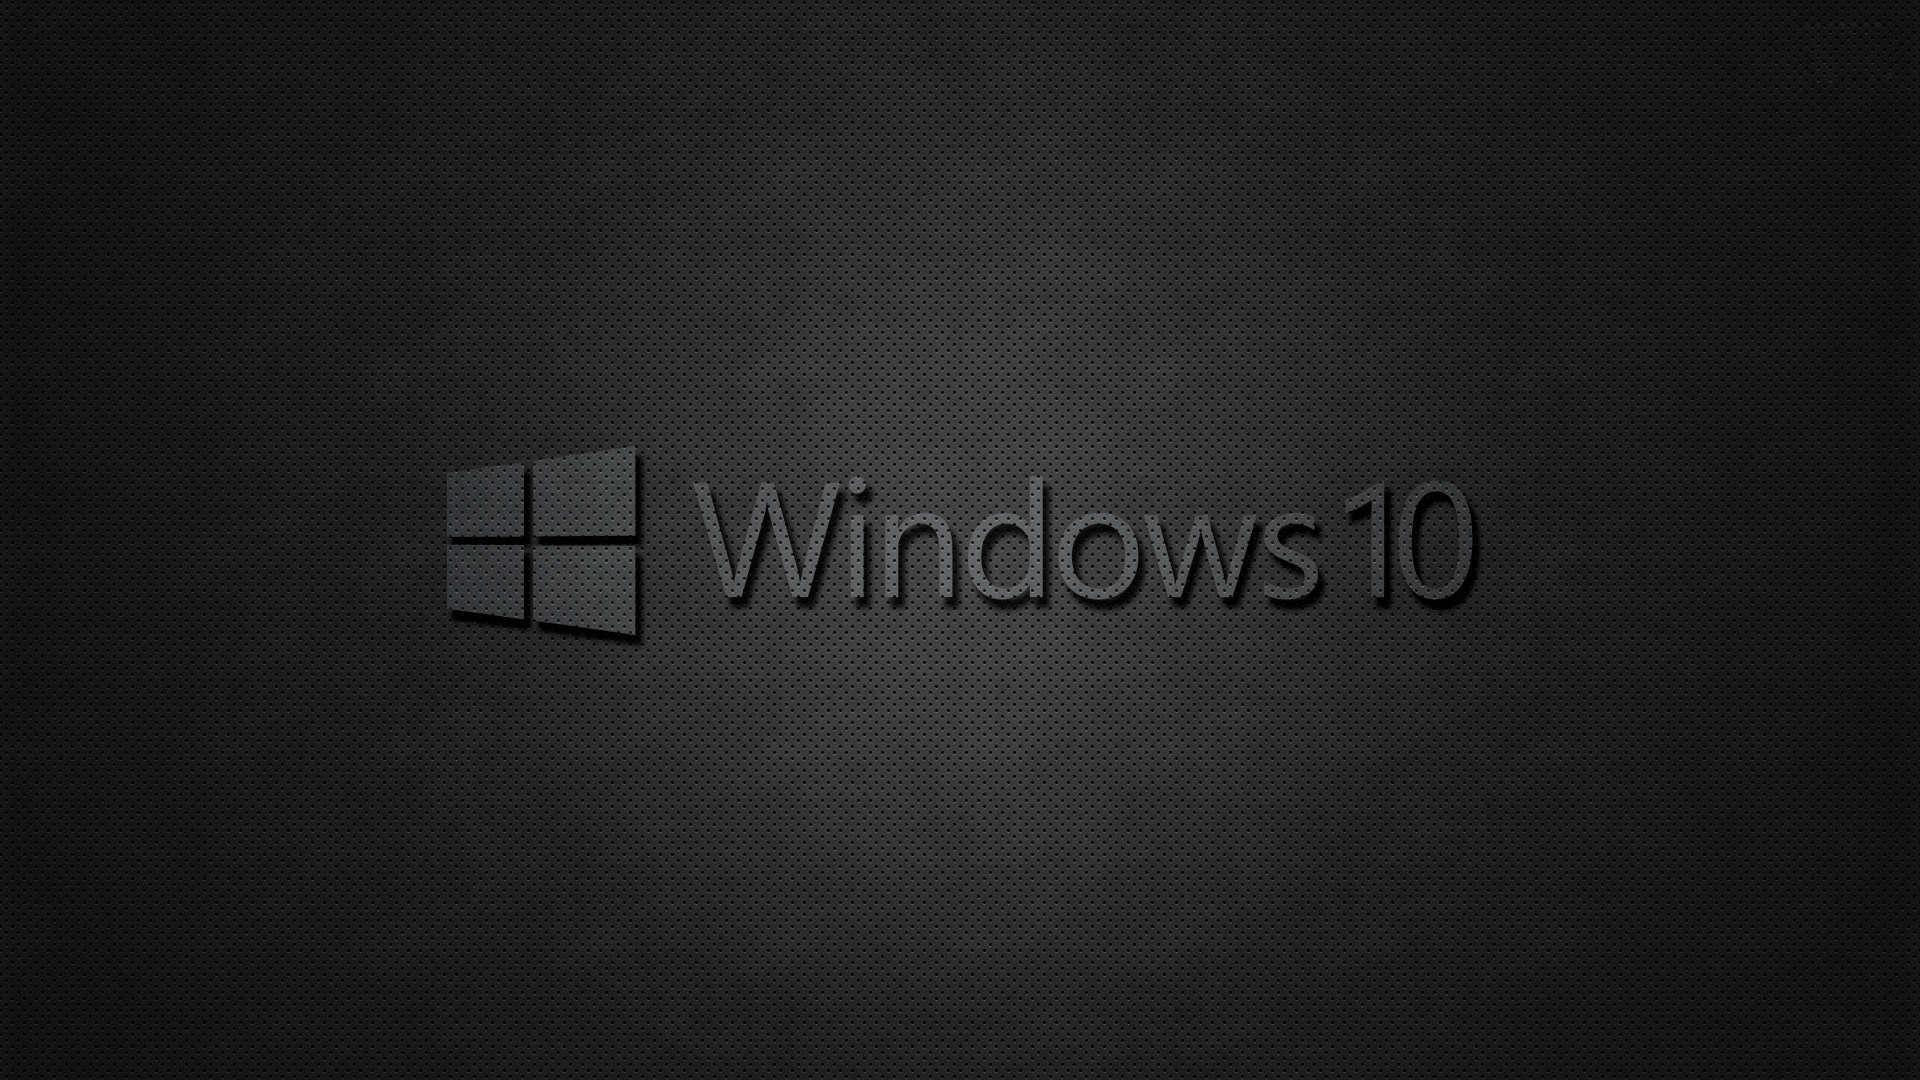 Hd wallpaper upload - Wallpaper Windows 10 Black Hd Wallpaper 1080p Upload At January 7